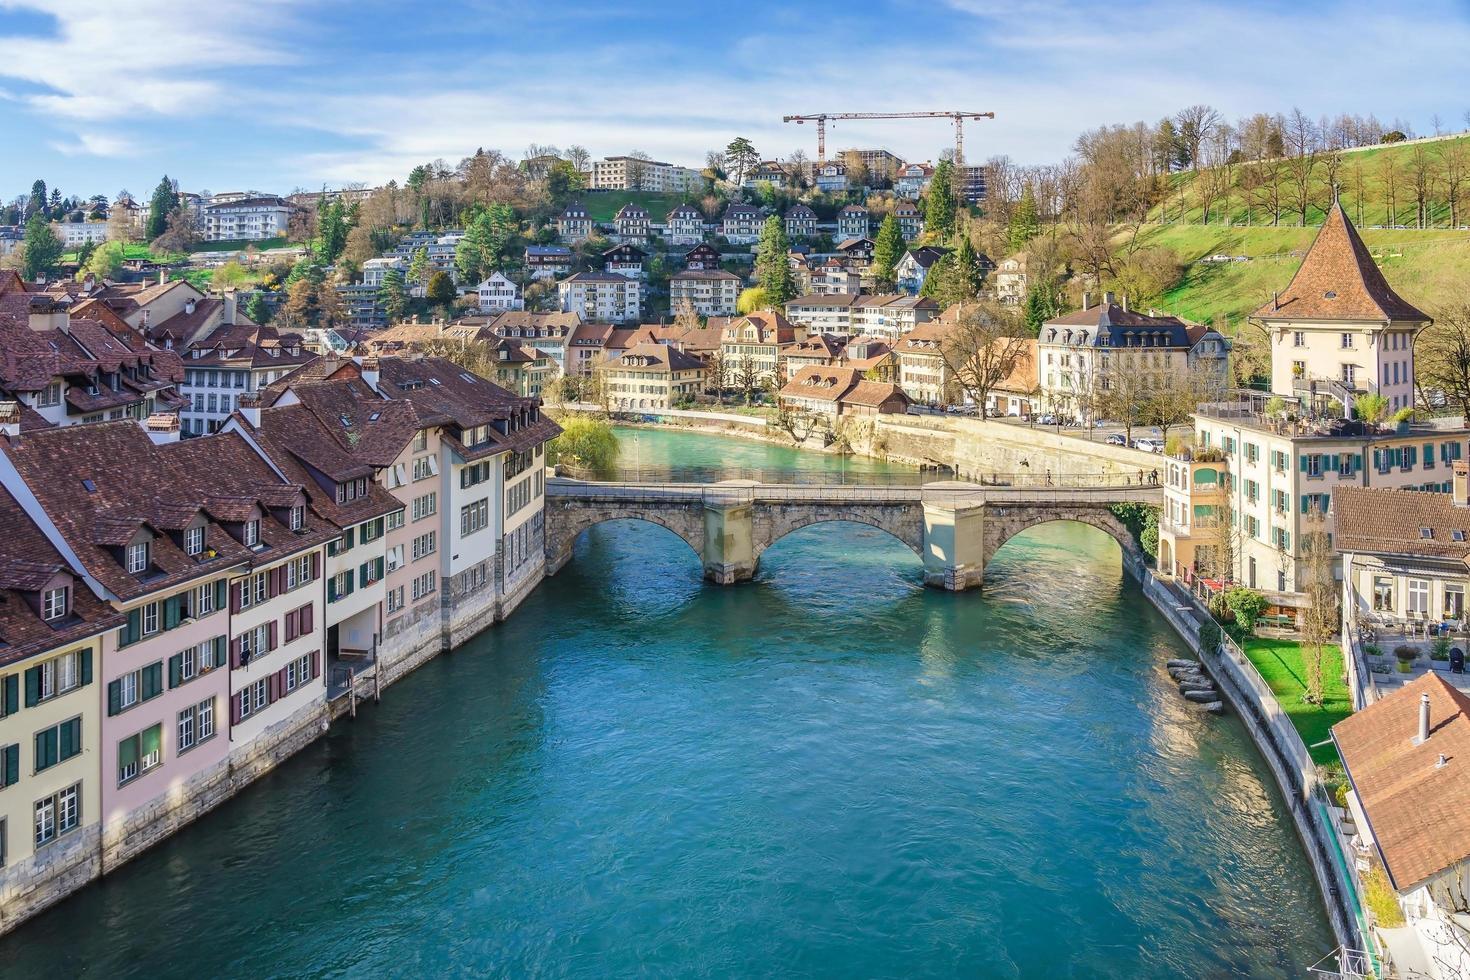 Blick auf die Altstadt Bern in der Schweiz foto